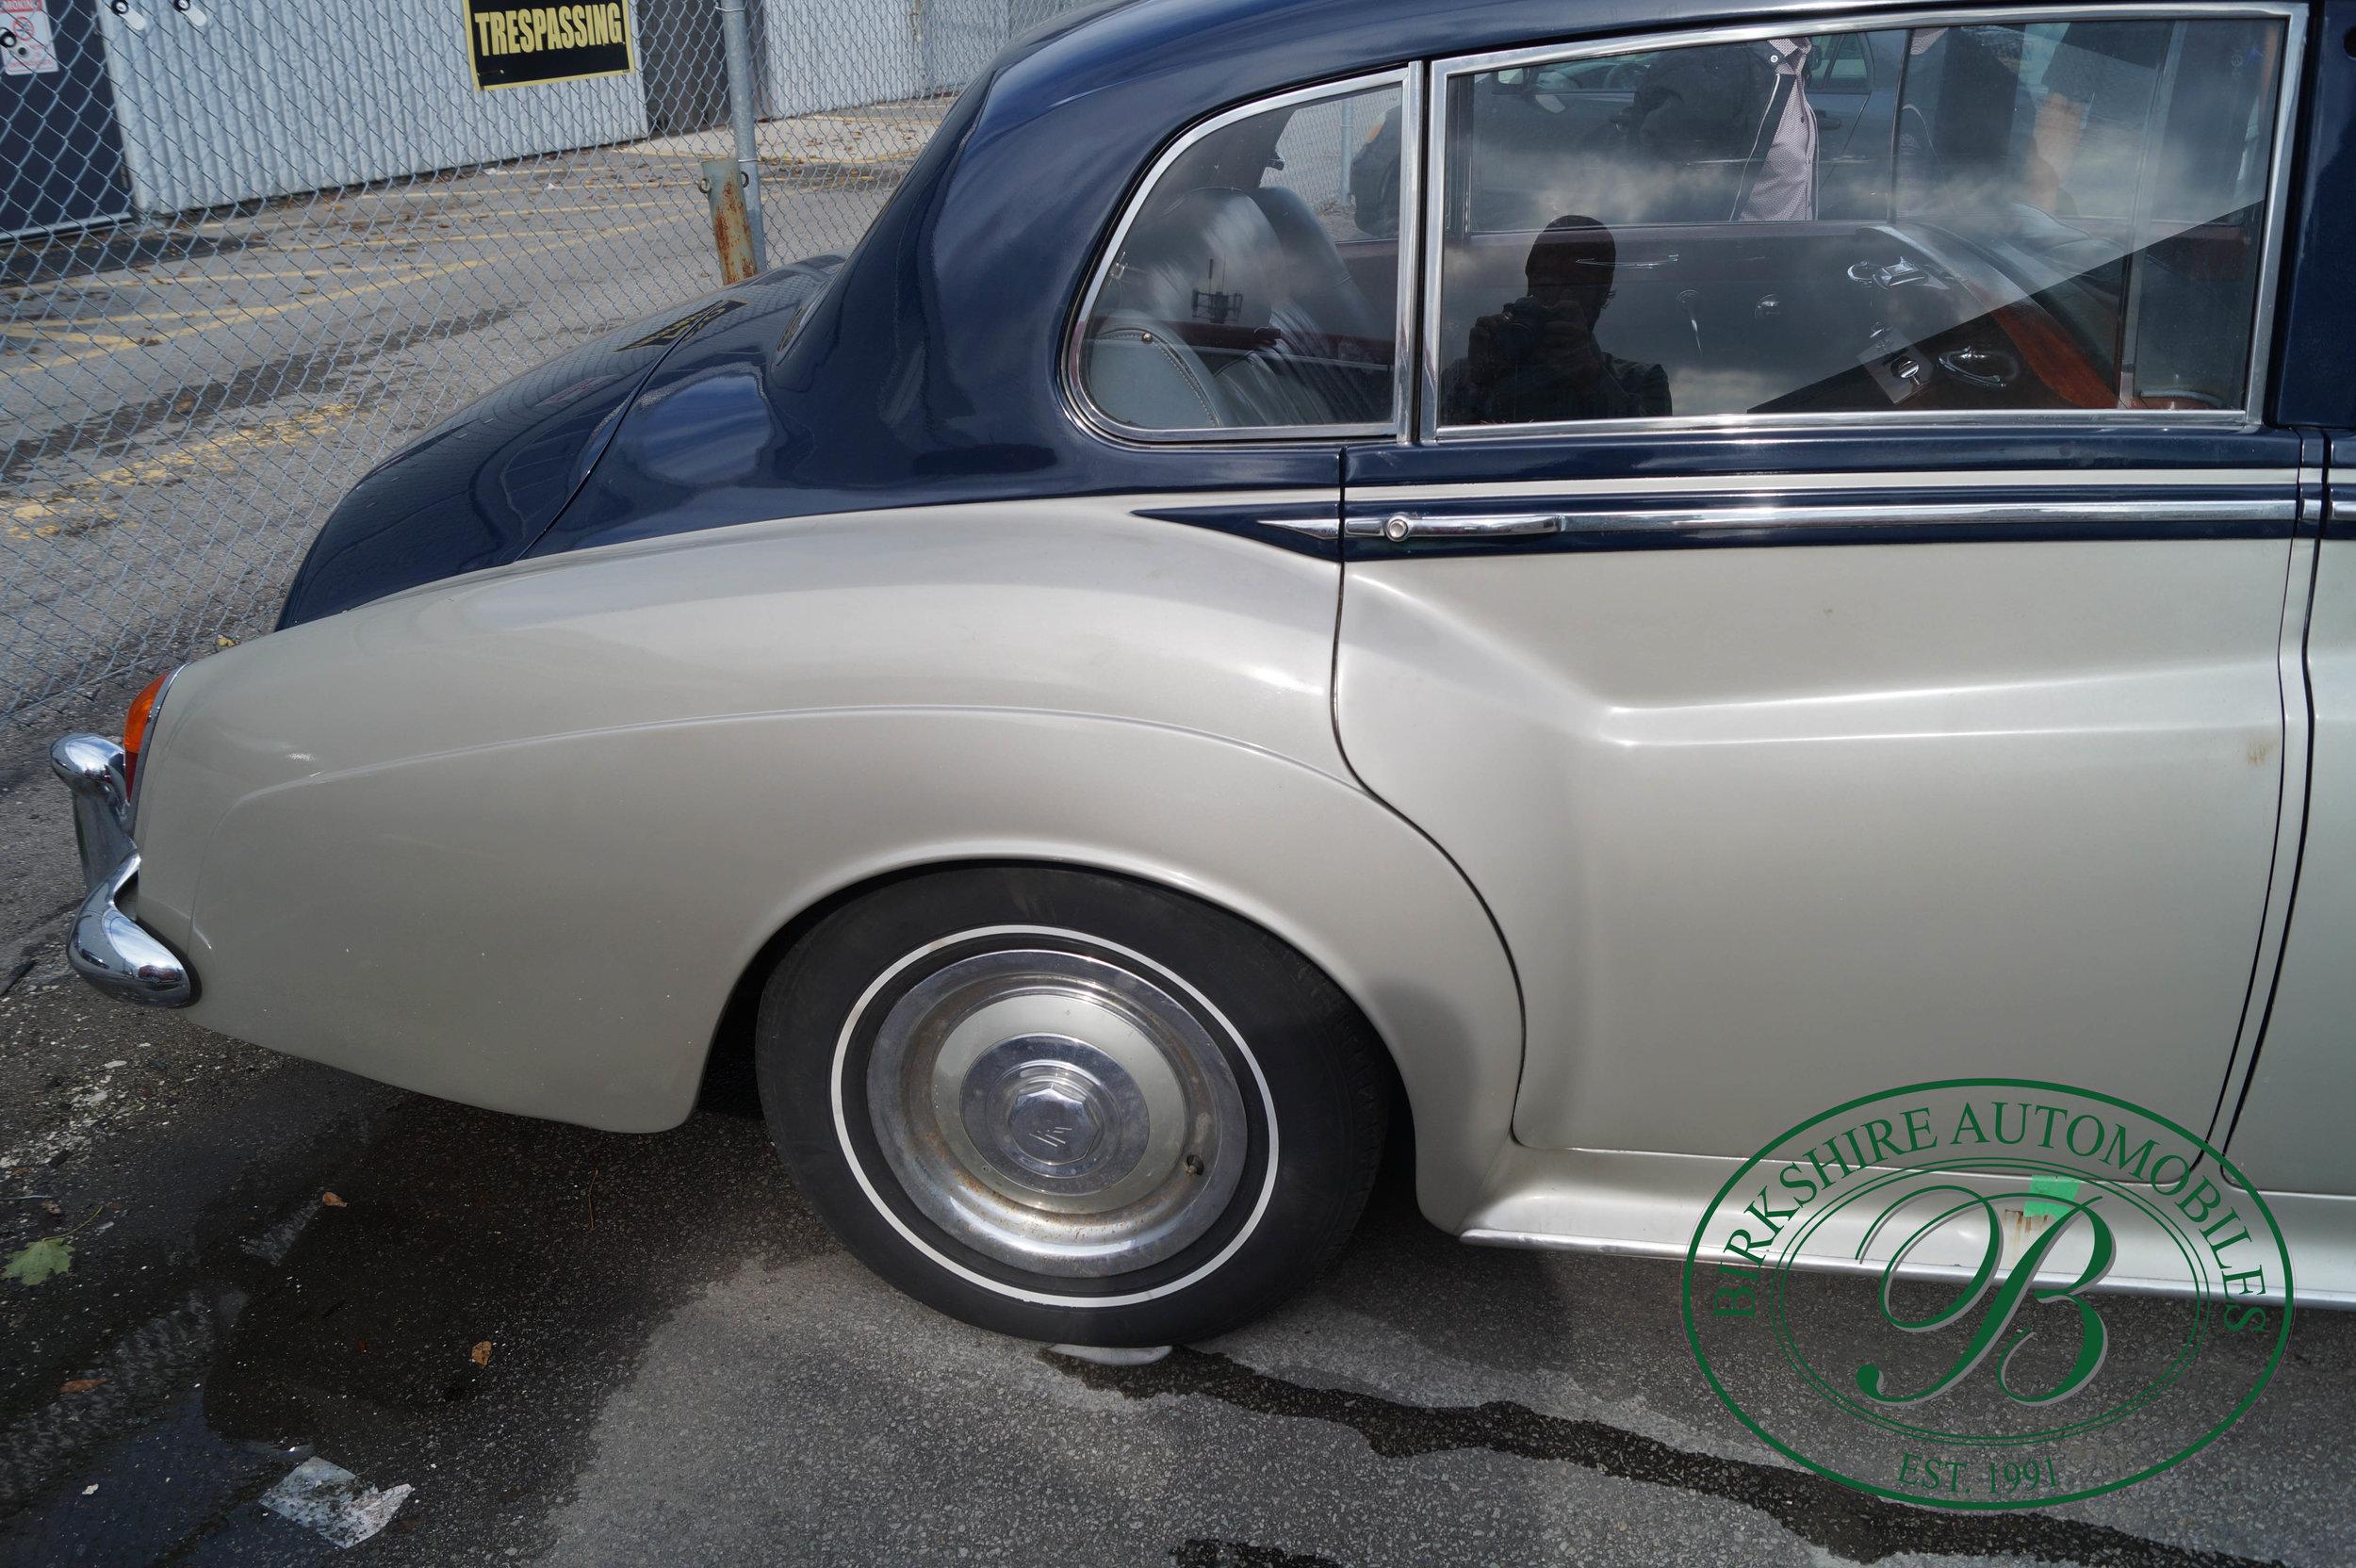 Birkshire Automobiles 1960 Rolls Royce Silver Cloud-8.jpg